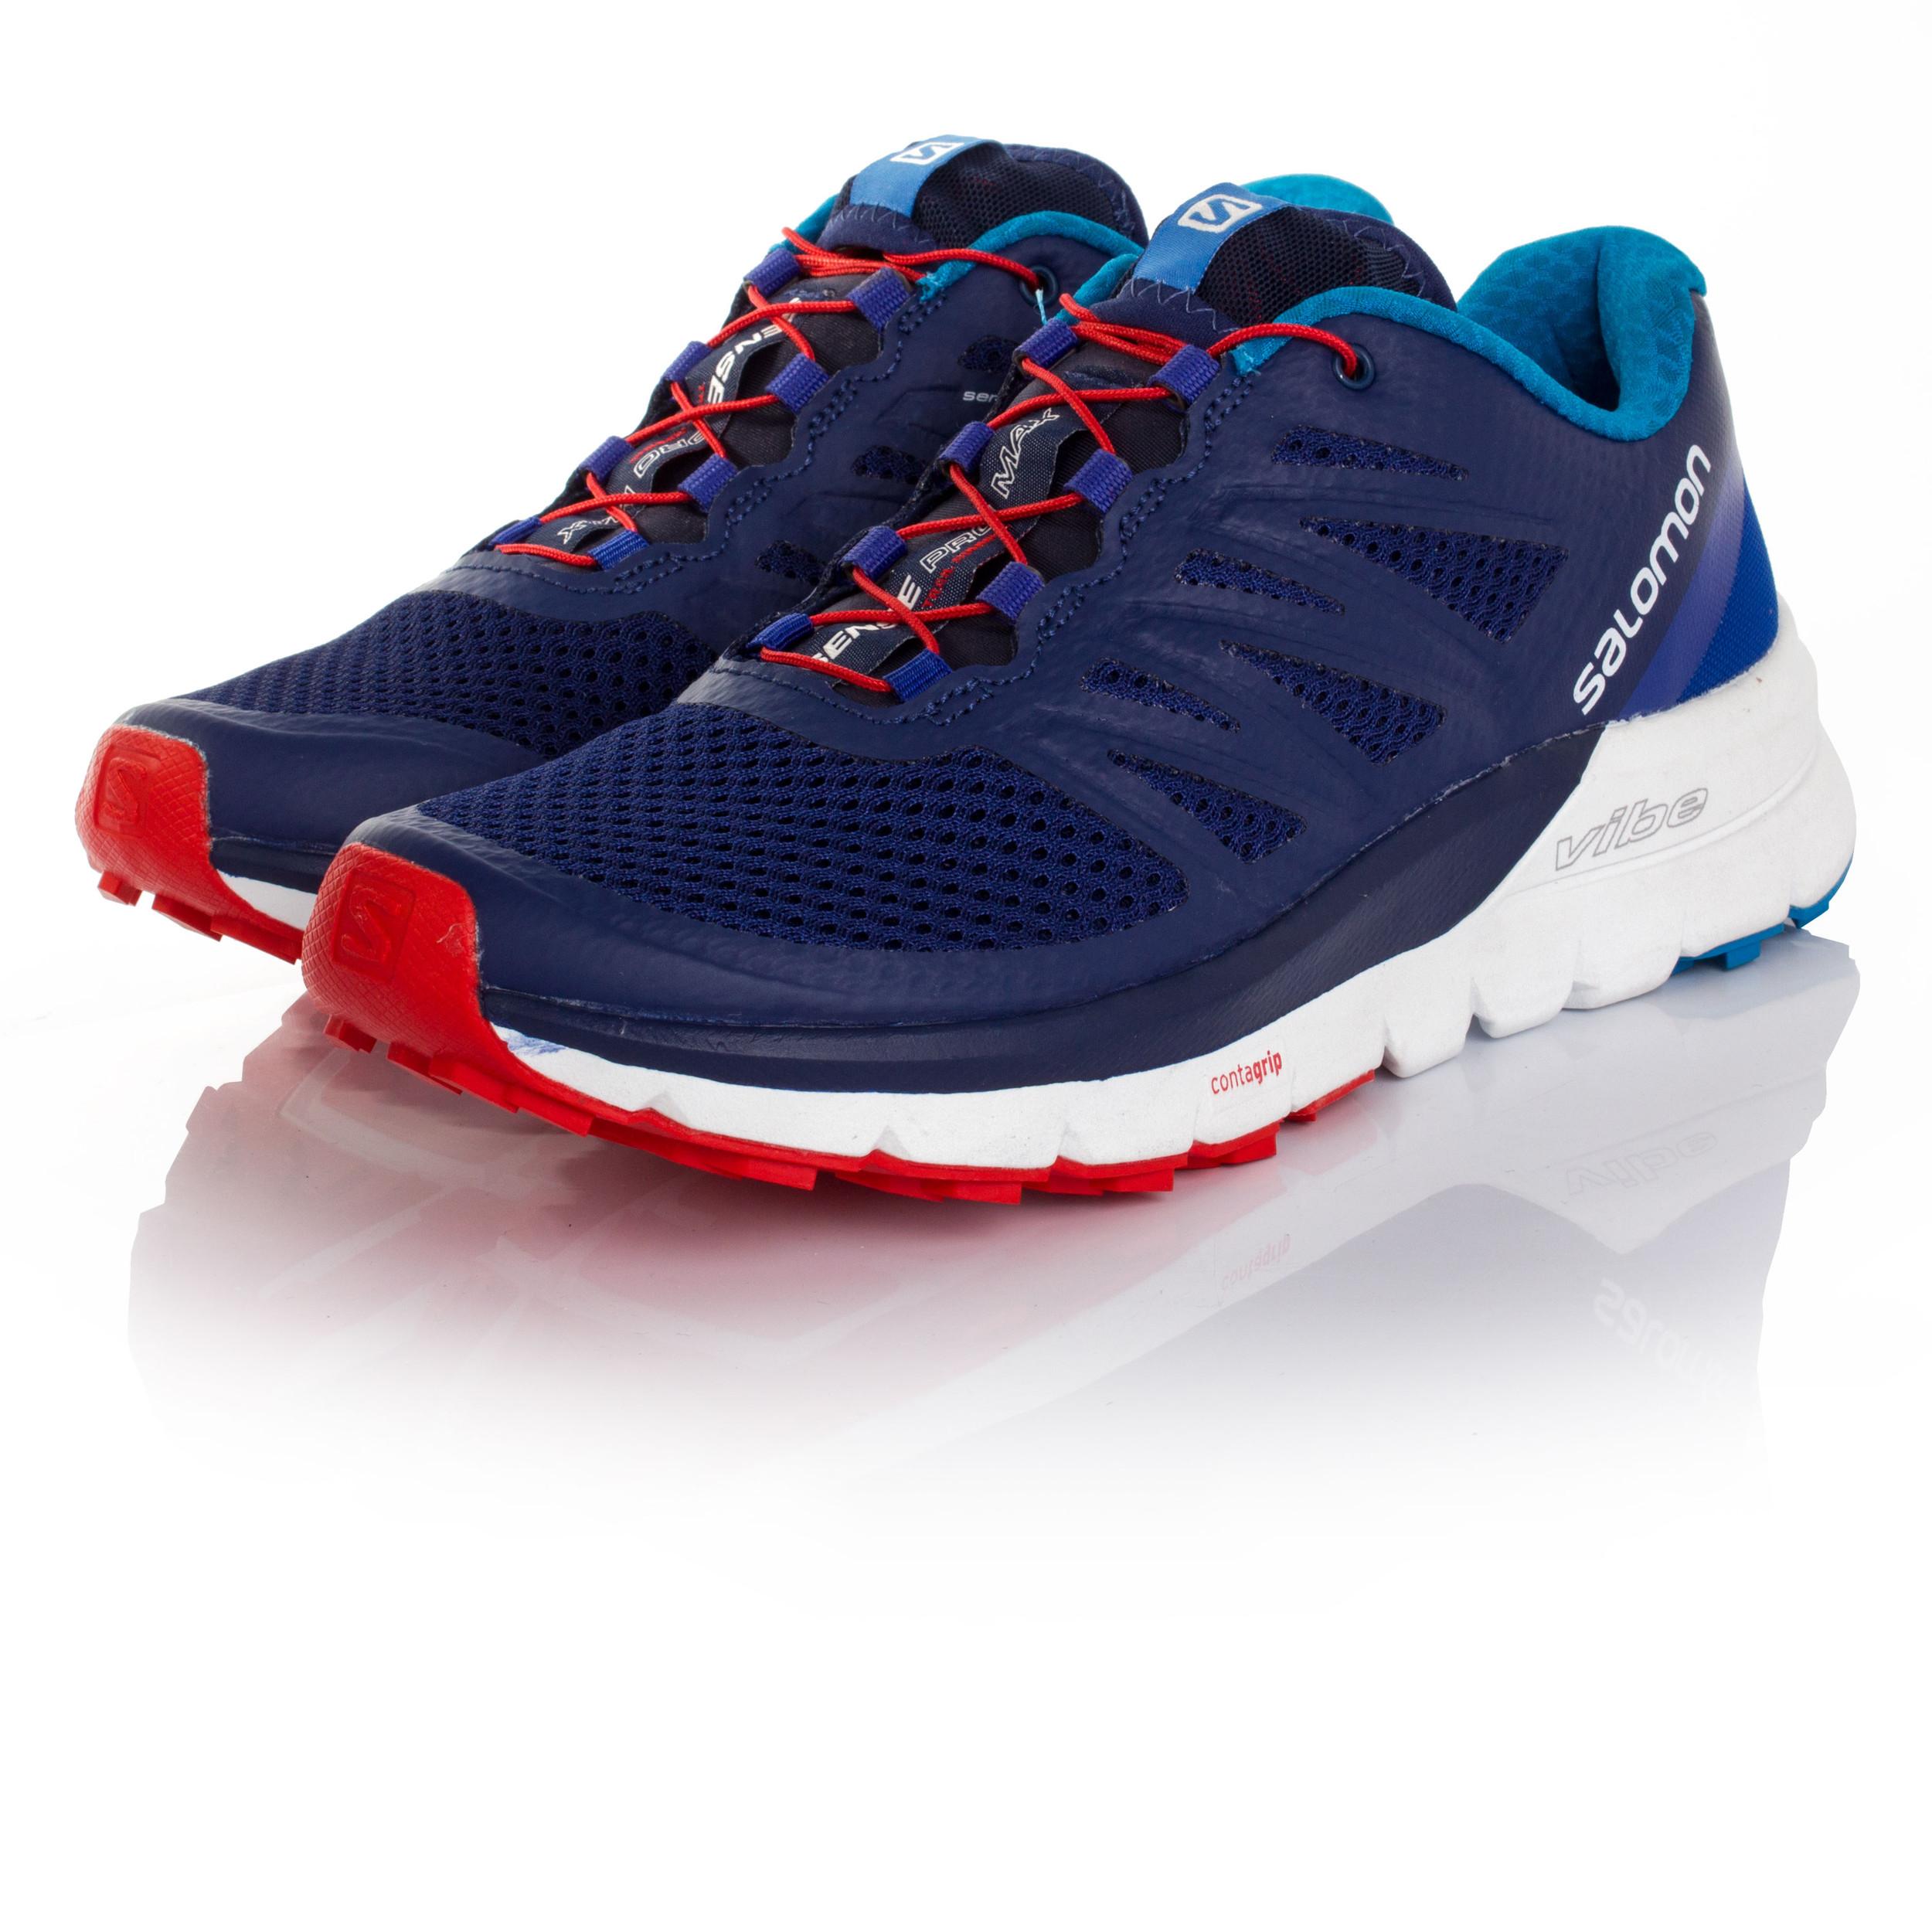 salomon sense pro max mens blue trail running sports shoes trainers pumps ebay. Black Bedroom Furniture Sets. Home Design Ideas